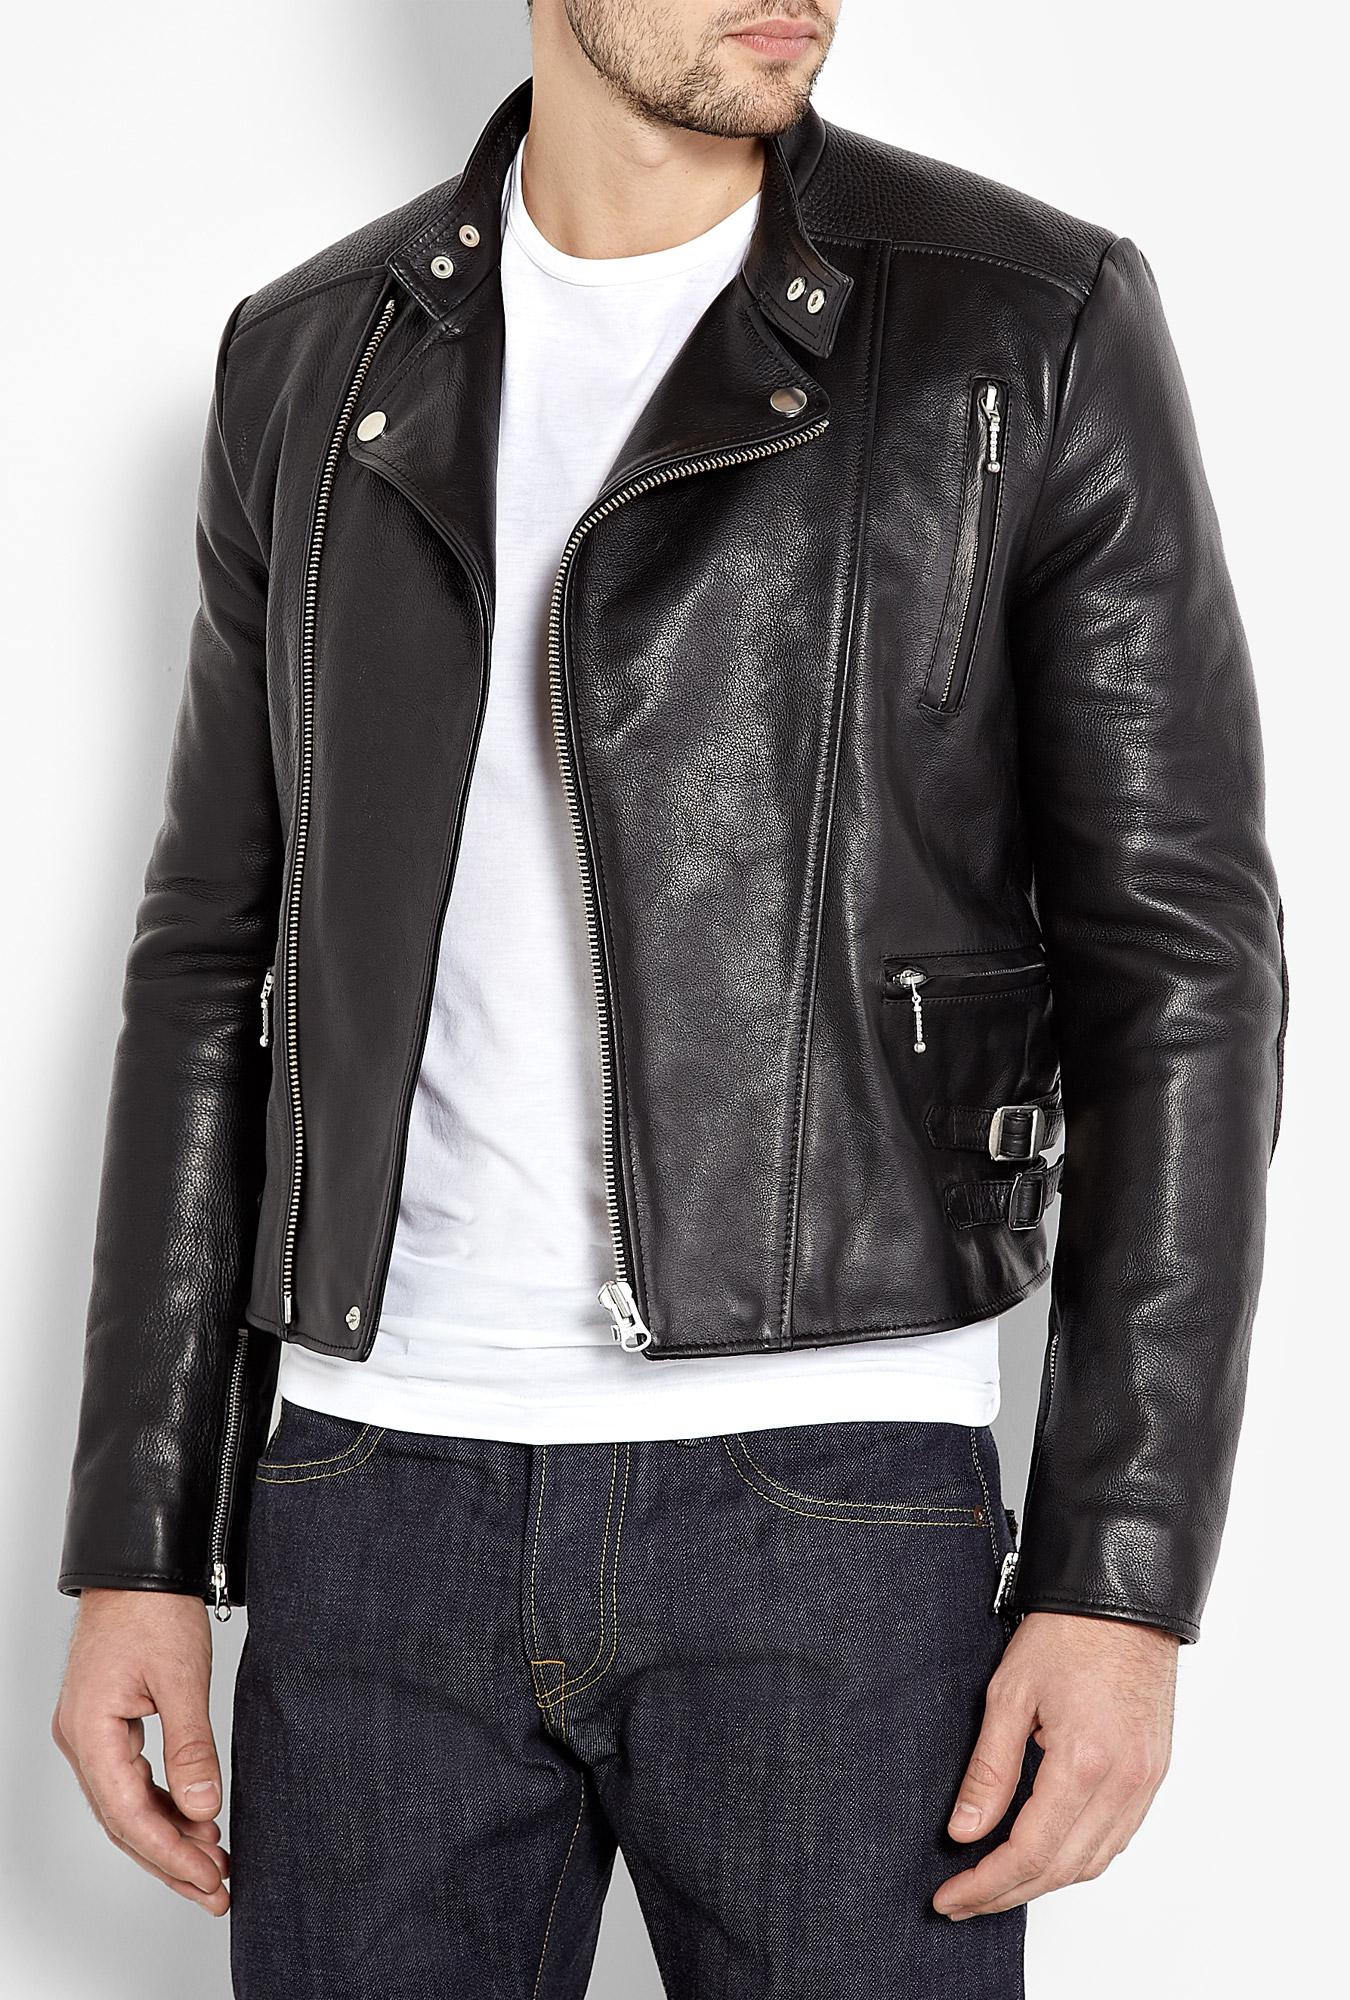 Acne Studios Black Leather Blues Biker Jacket in Black for Men | Lyst